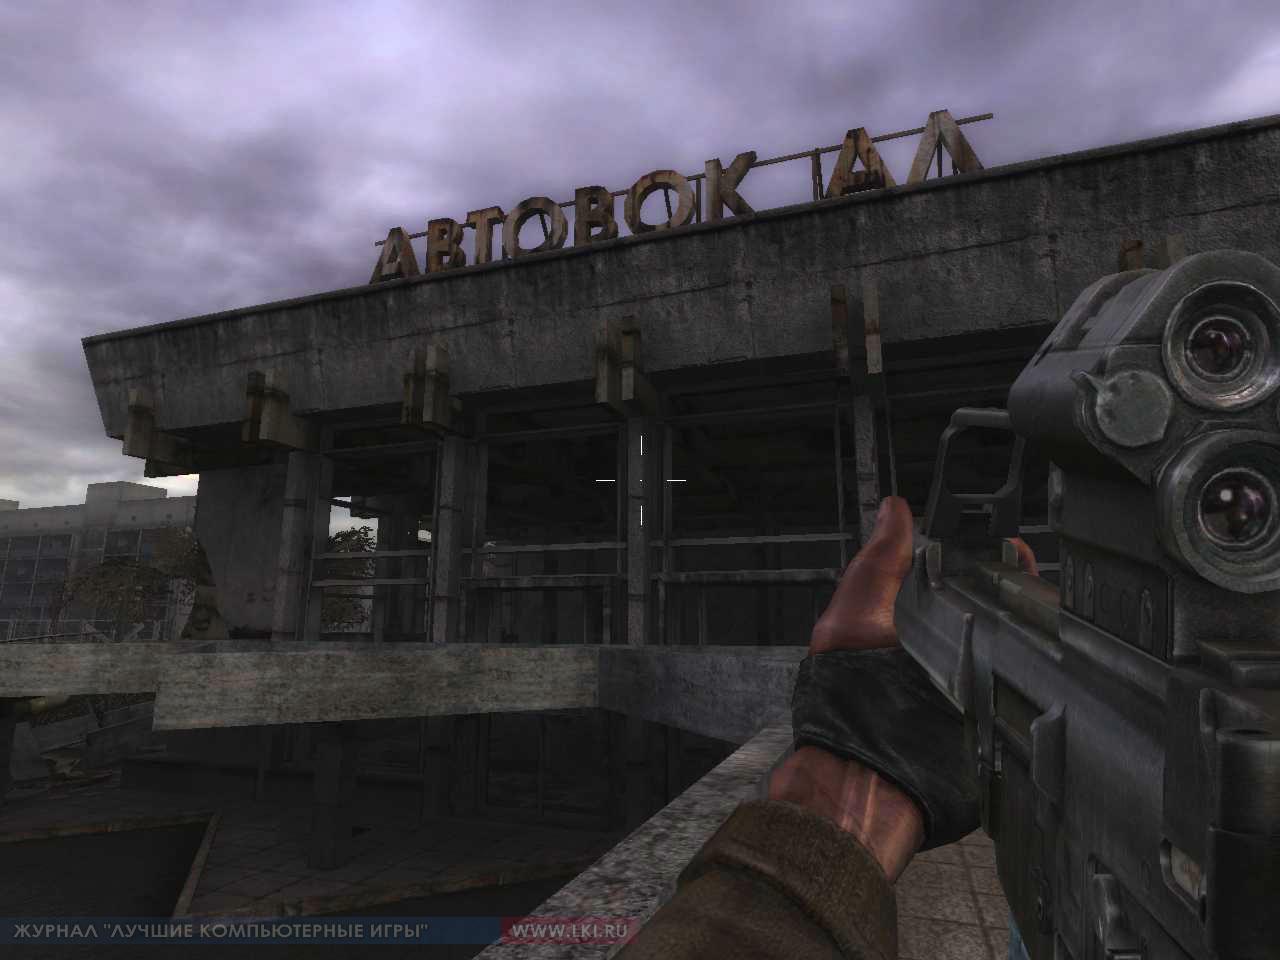 Stalker shadow of chernobyl no cd crack. minecraft cracked servers no hamac